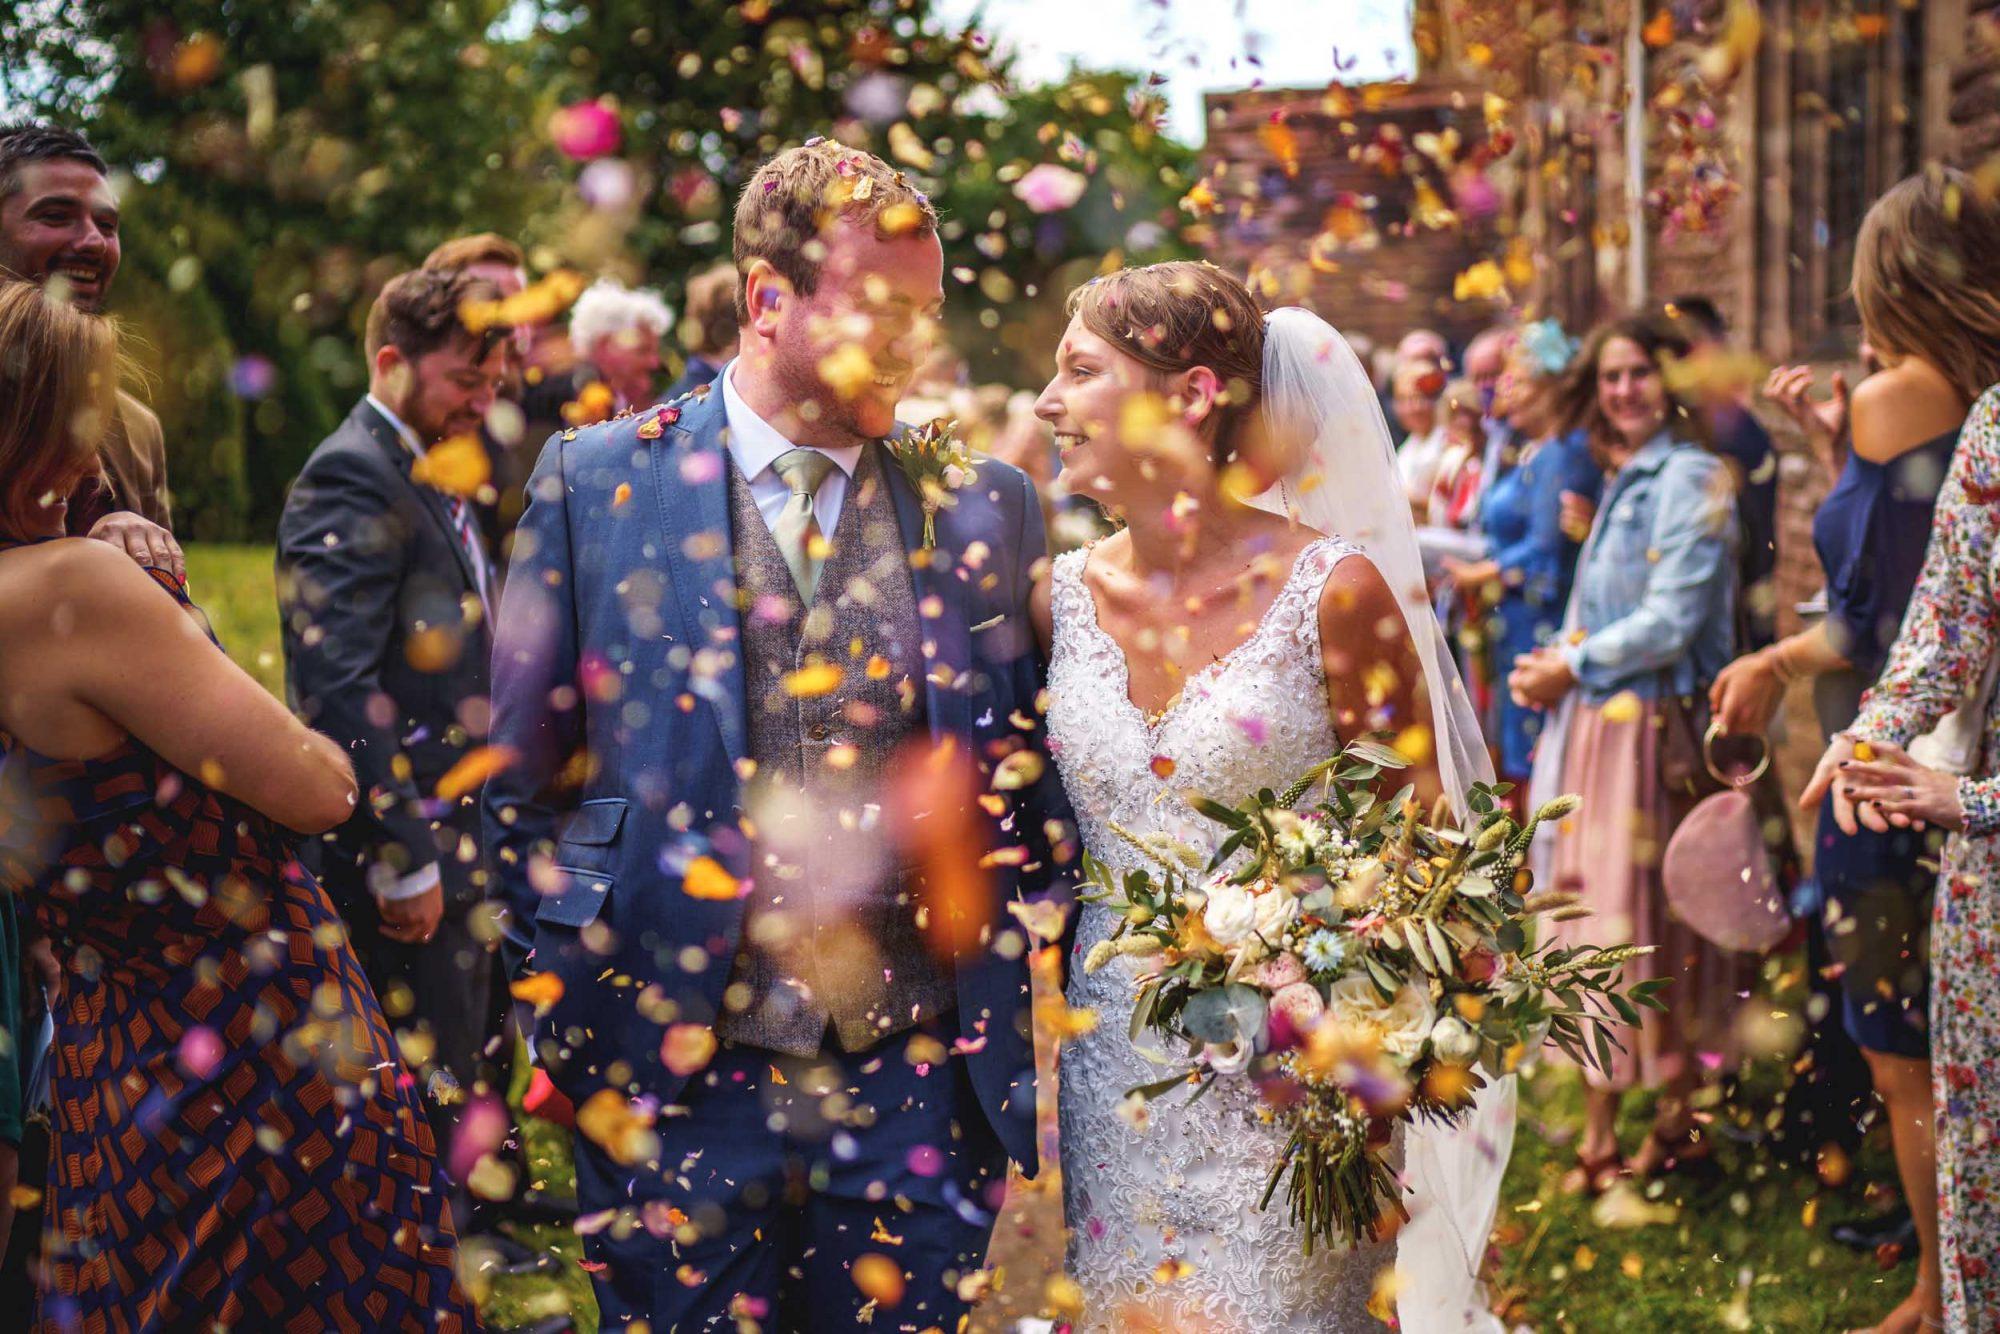 Lyde Court wedding photography, Wedding photographer Lyde Court, Lyde Court, Herefordshire Wedding Photographer, Weddiing photographers in Herefordshire,